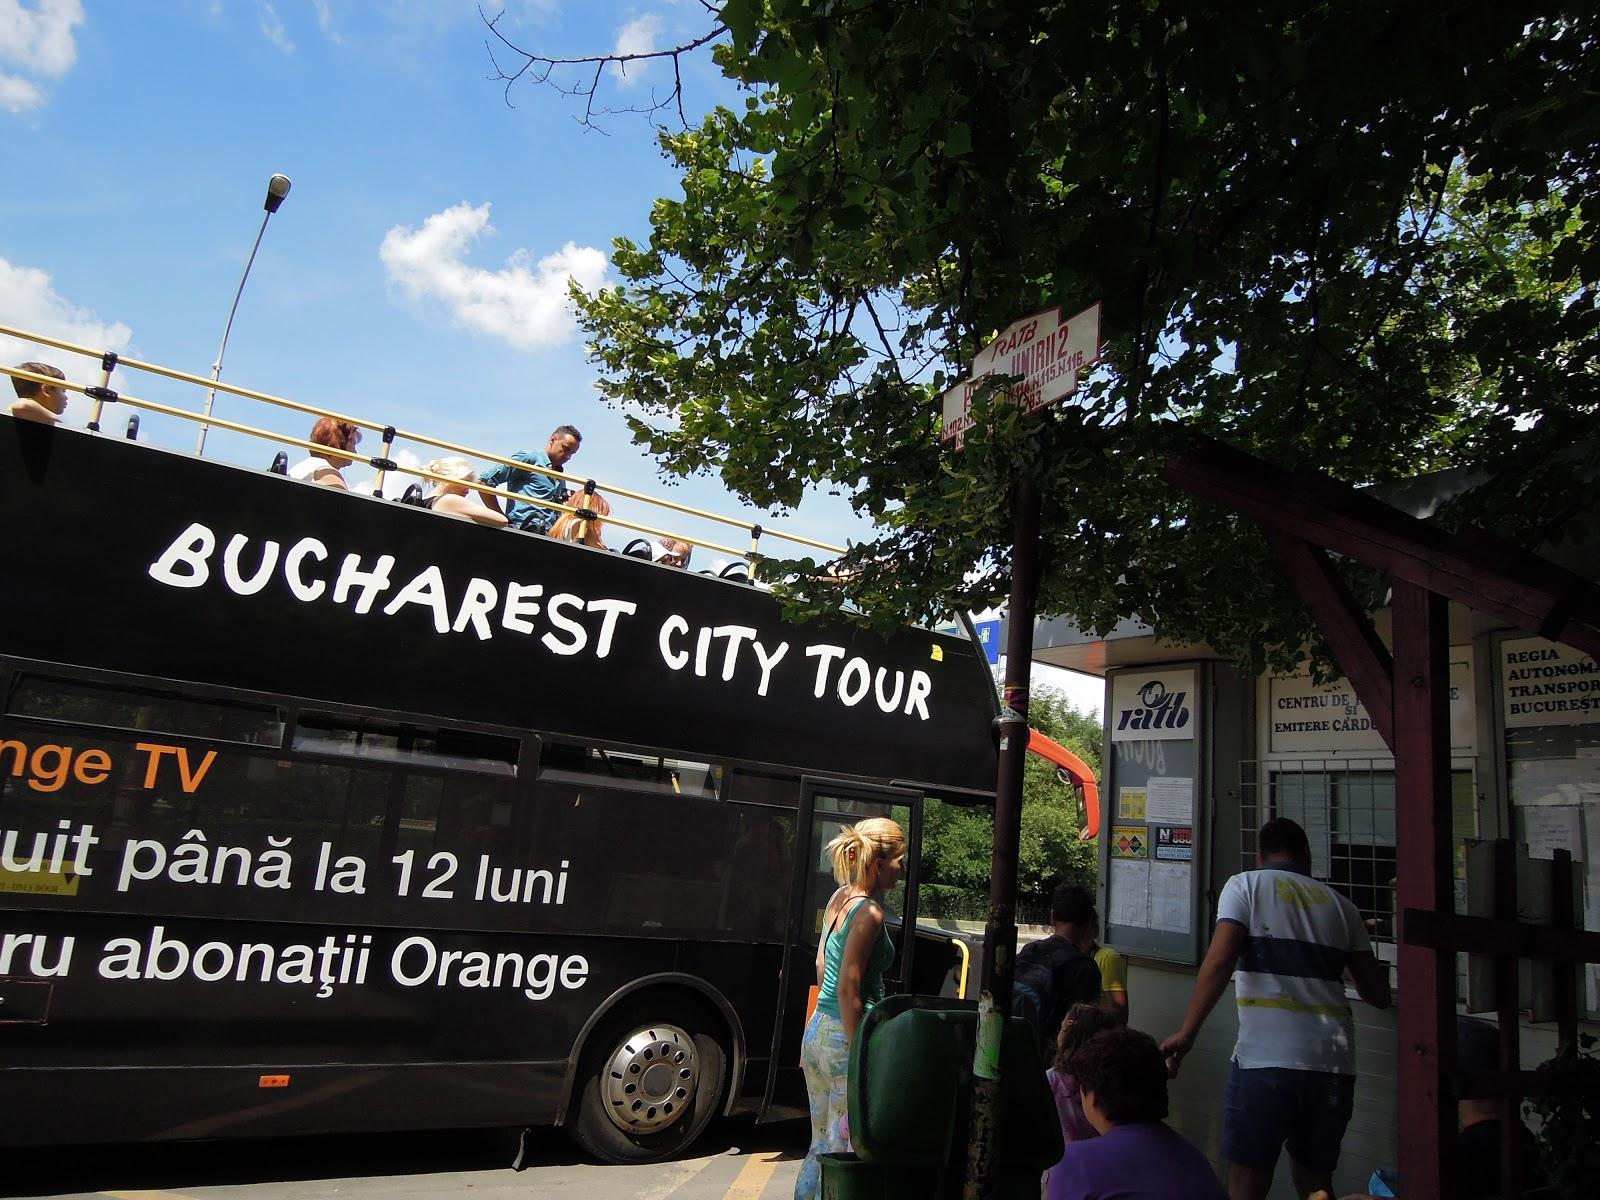 Statie Bucharest City Tour - Piata Unirii - langă intrarea metrou de la Restaurant Horoscop